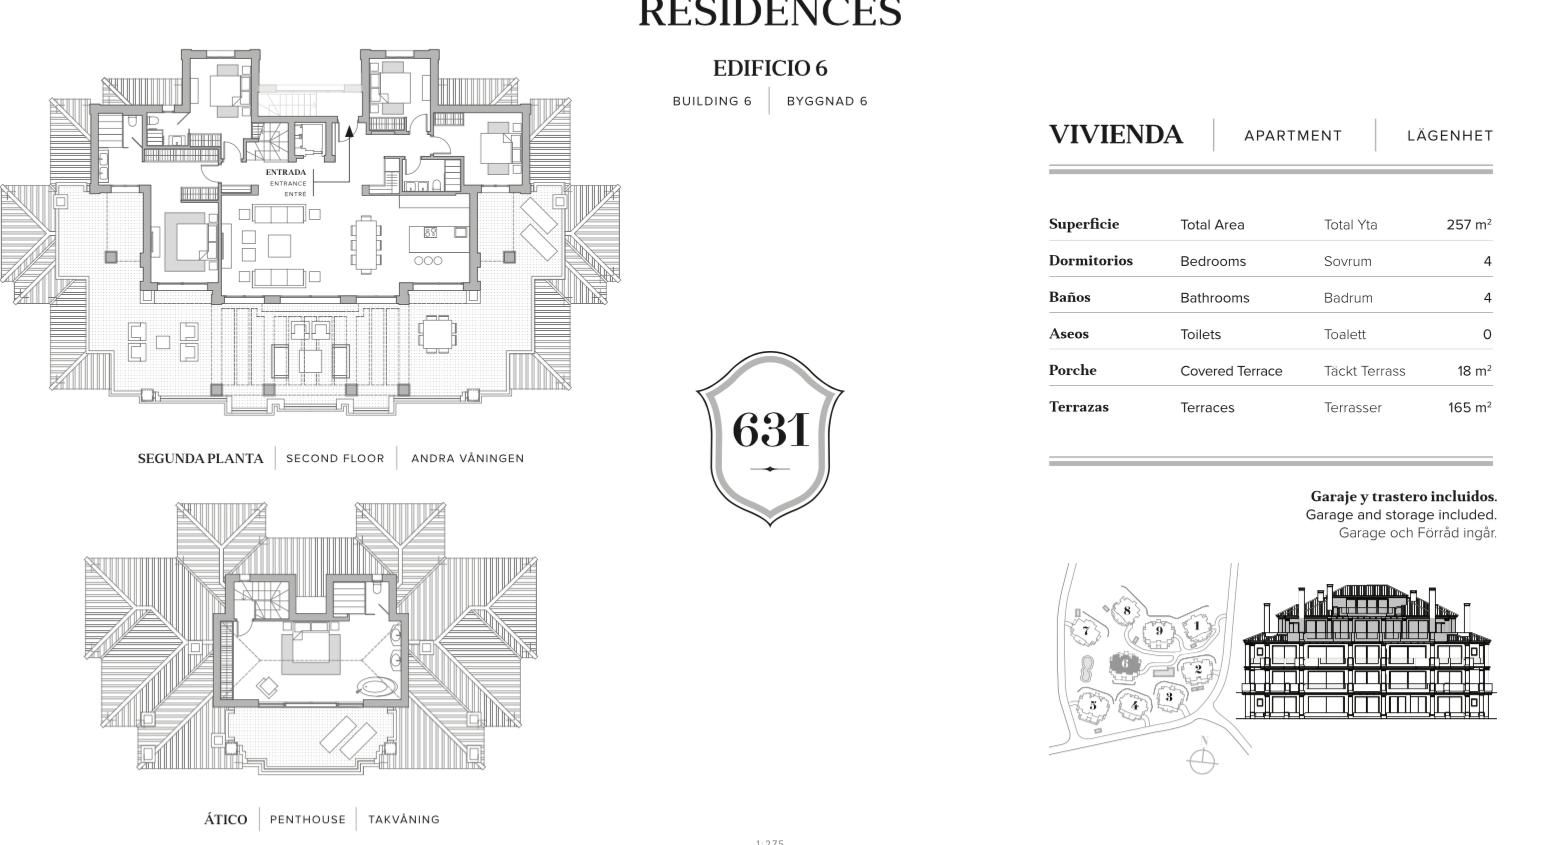 nine lions residences appartementen penthouses te koop nueva andalucia grondplan penthouse 5 slaapkamers